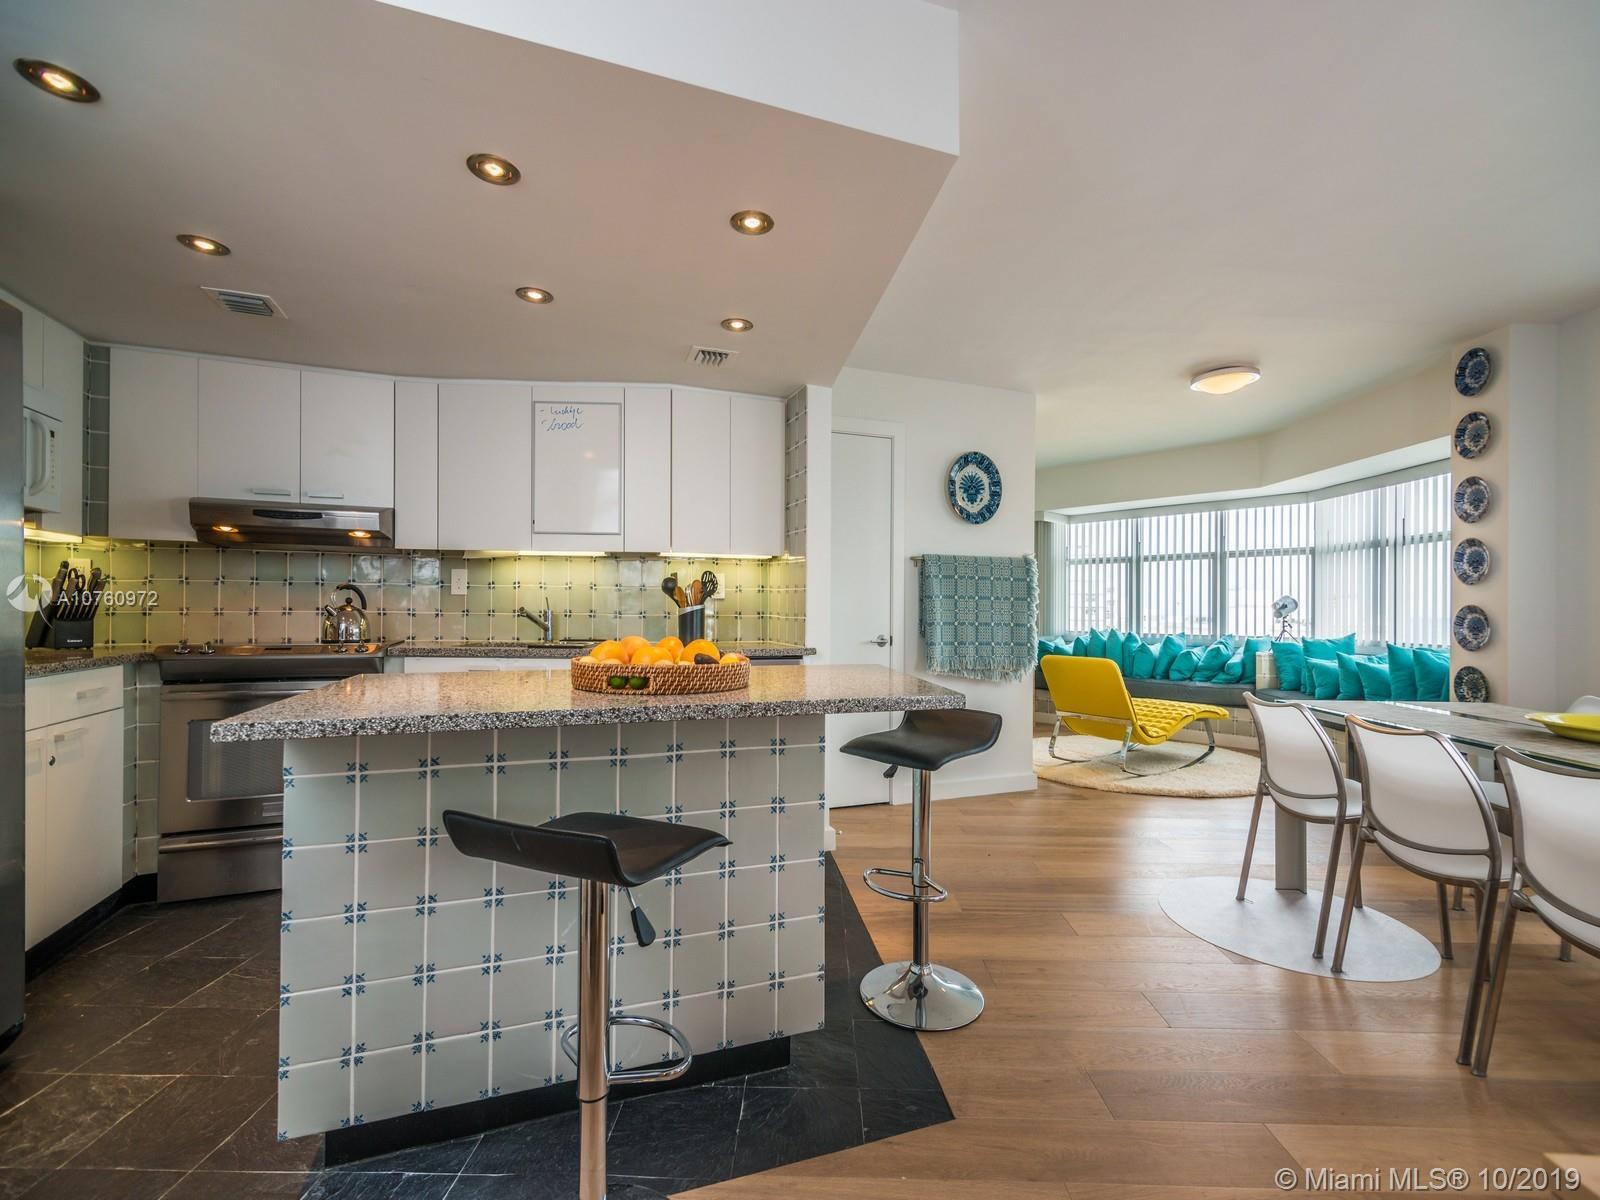 1881 Washington Ave # 14F, Miami Beach, Florida 33139, 2 Bedrooms Bedrooms, ,2 BathroomsBathrooms,Residential,For Sale,1881 Washington Ave # 14F,A10760972